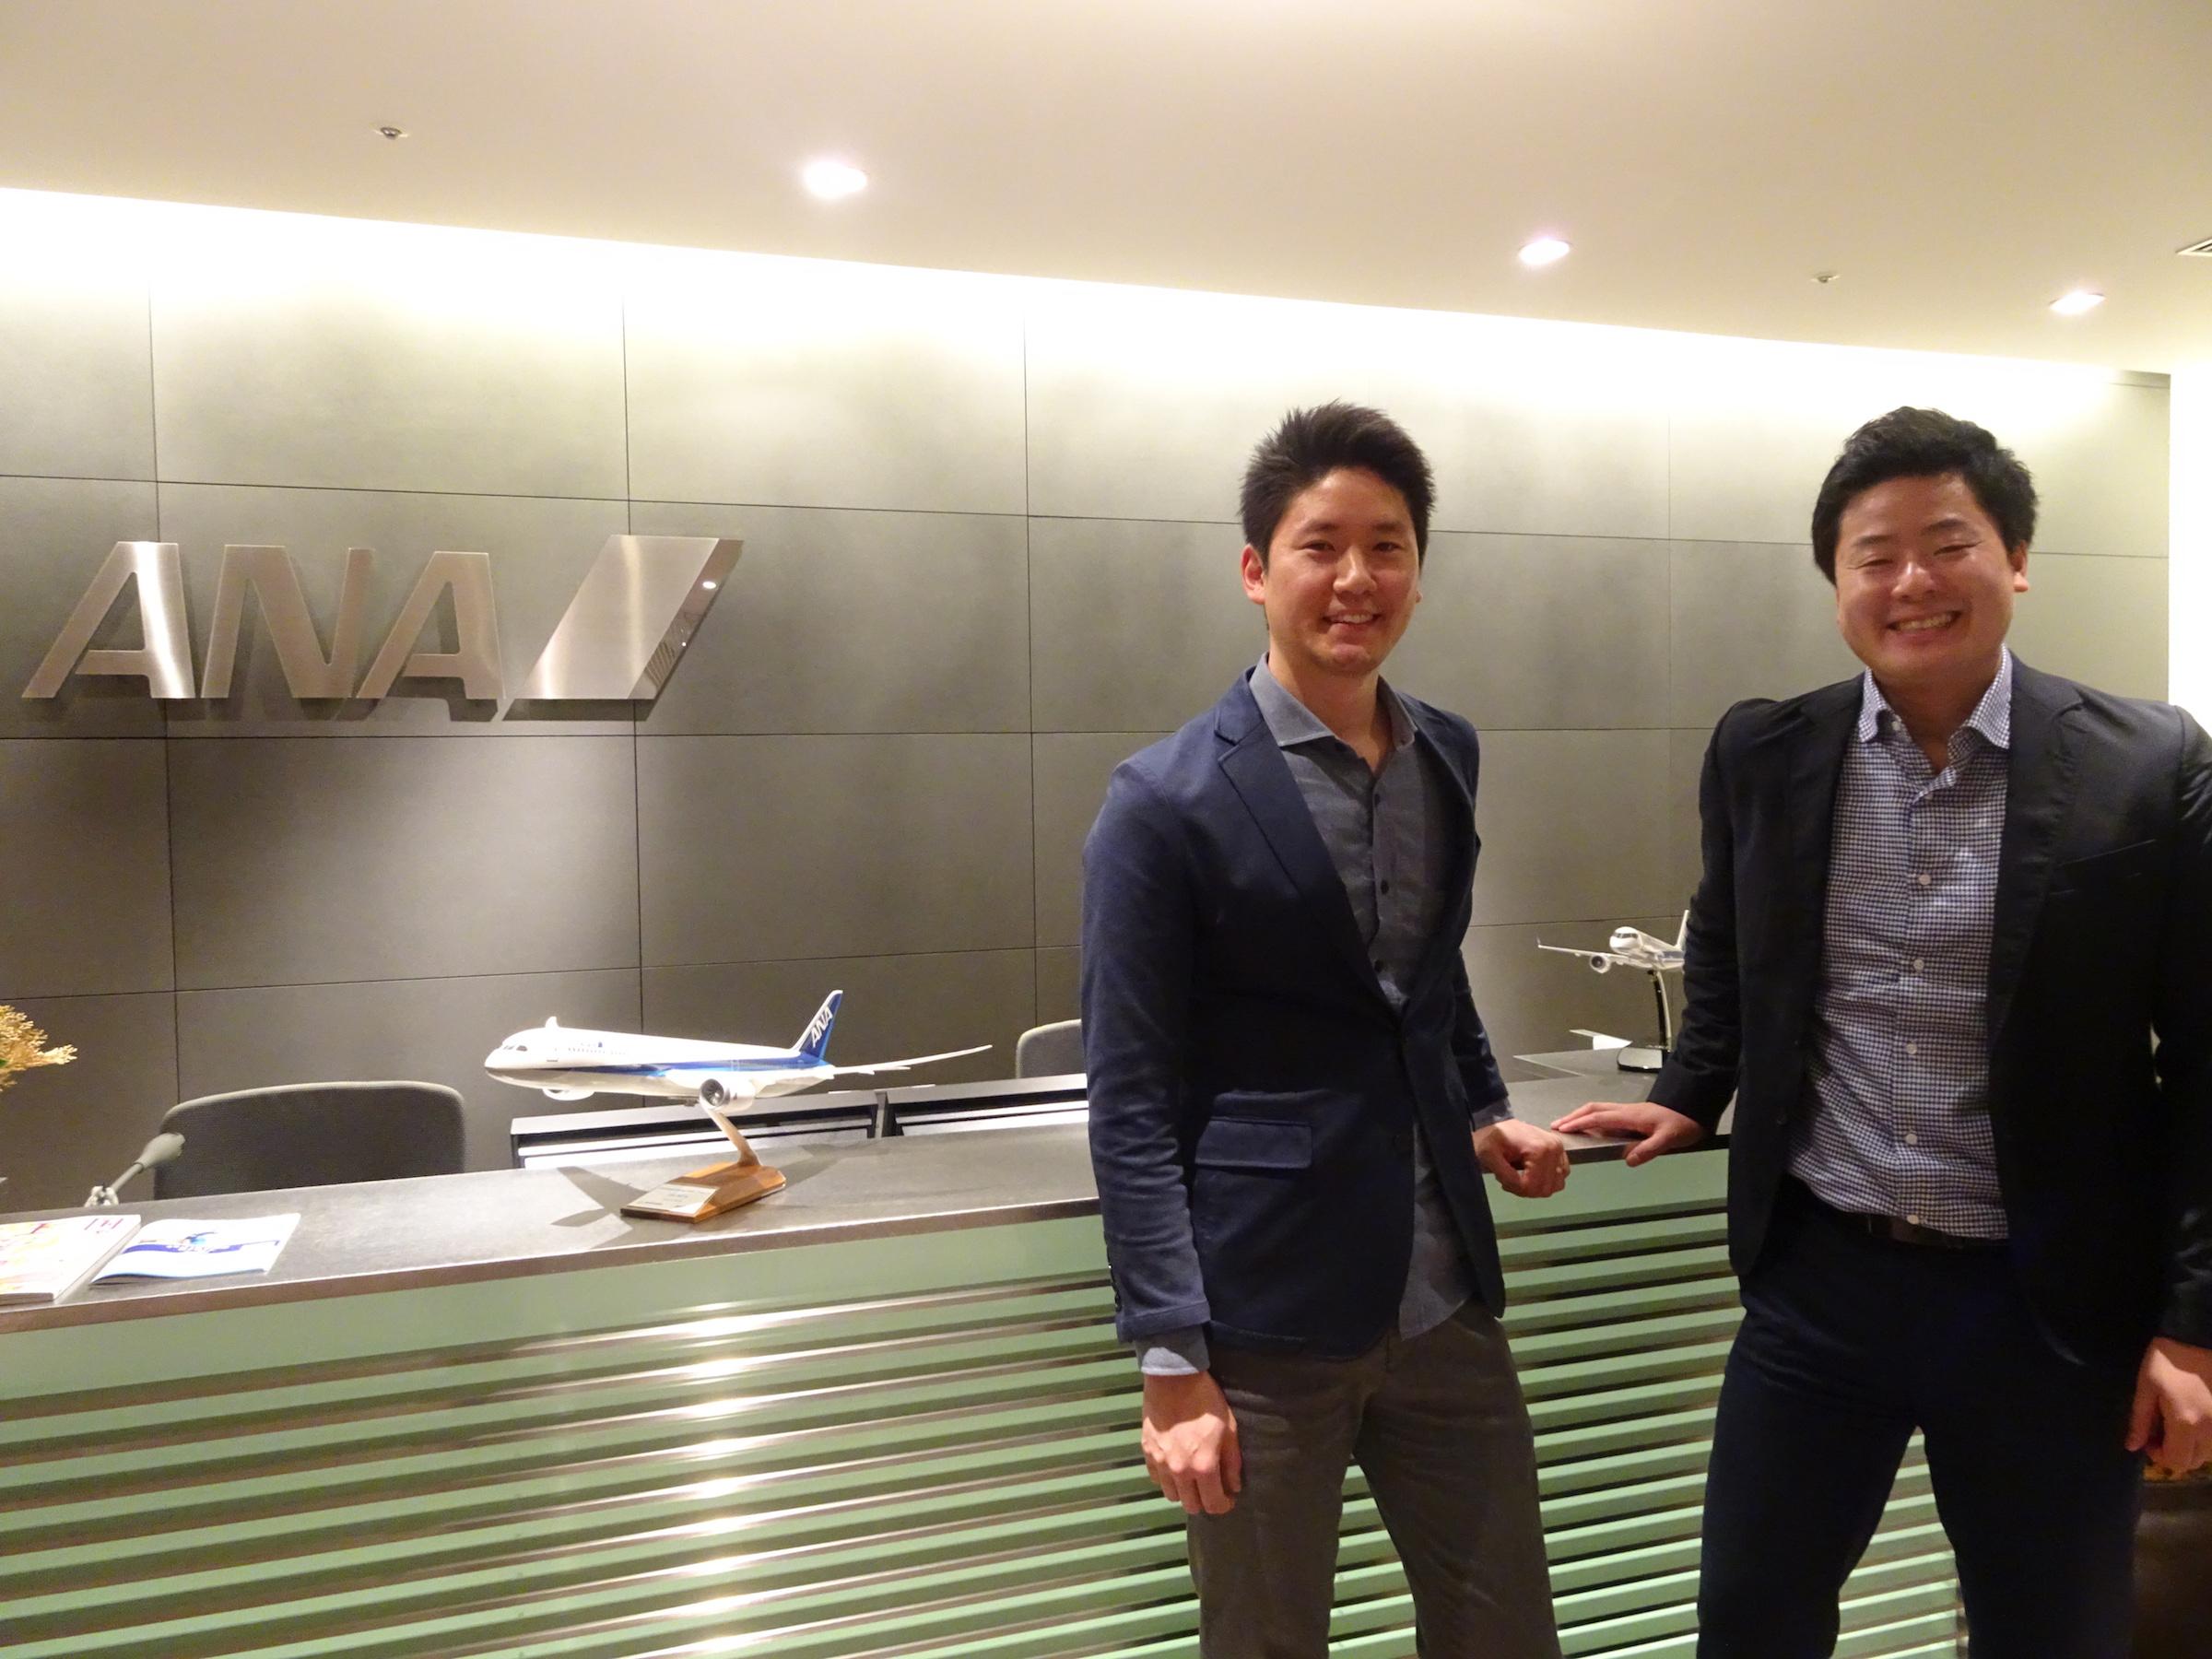 ANAホールディングスの深堀昴デジタル・デザイン・ラボ アバター・プログラム・ディレクター(右)と梶谷ケビン同ラボ イノベーション・リサーチャー